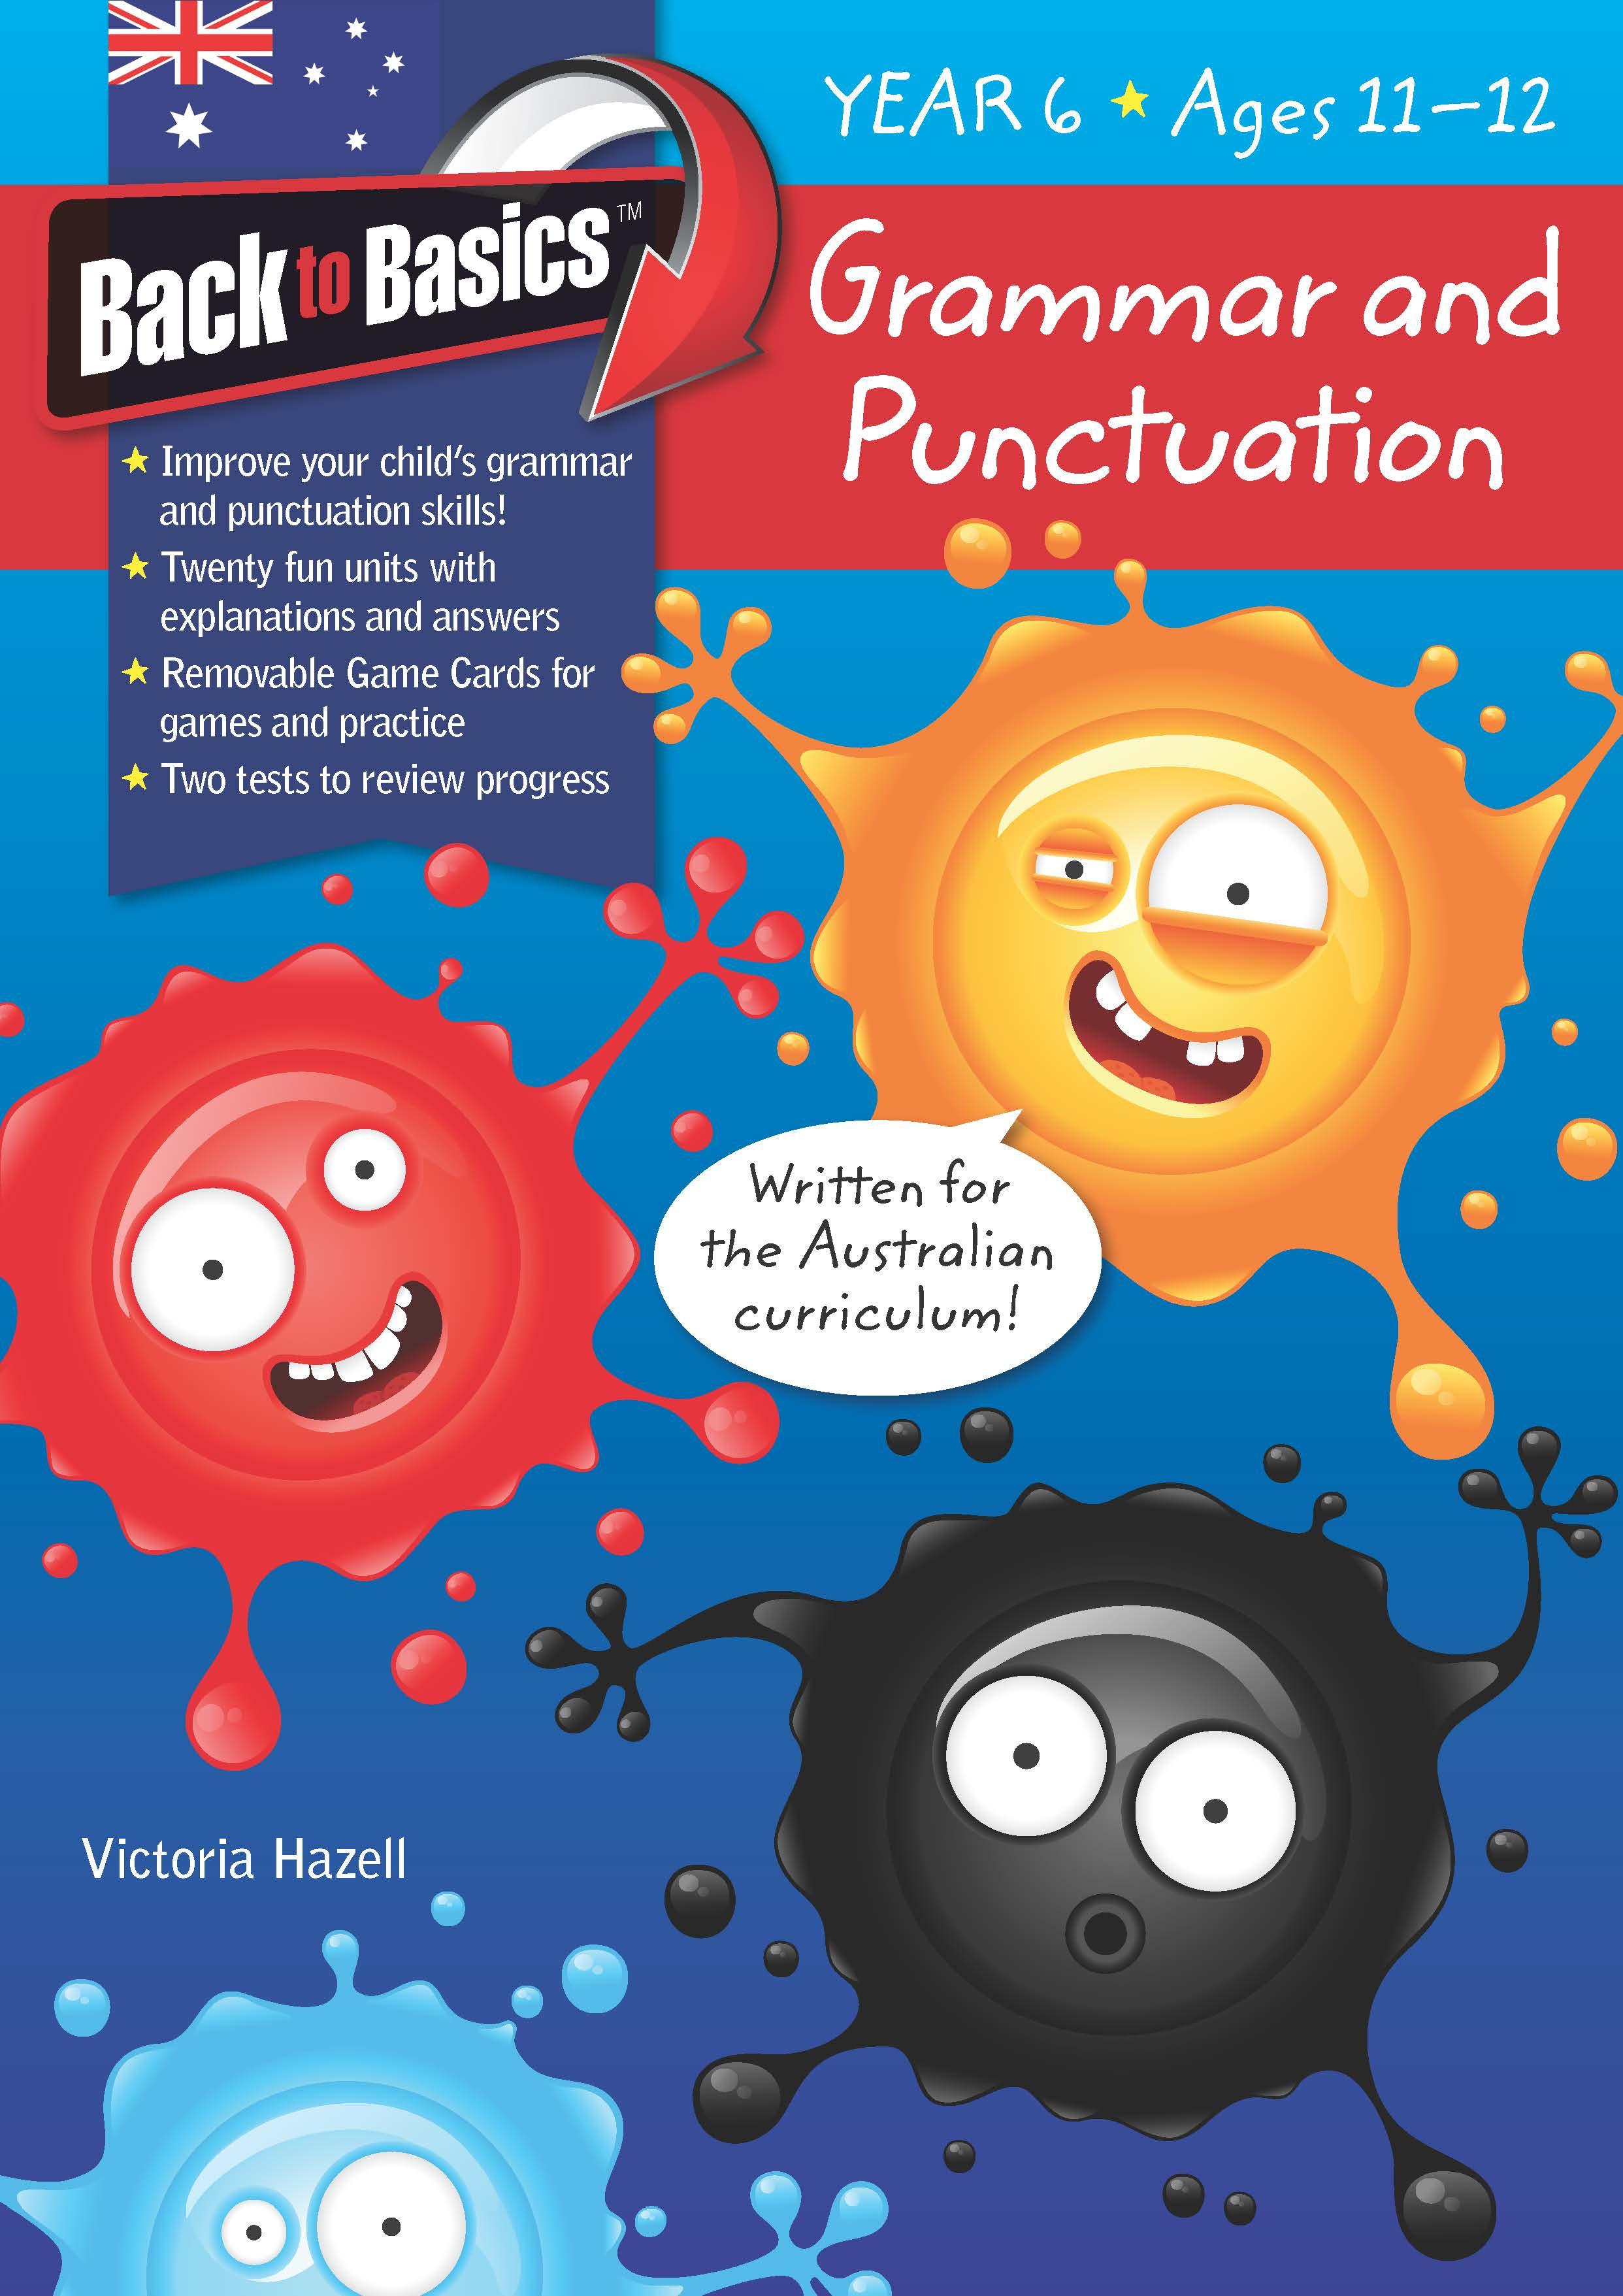 Back to Basics - Grammar & Punctuation Year 6